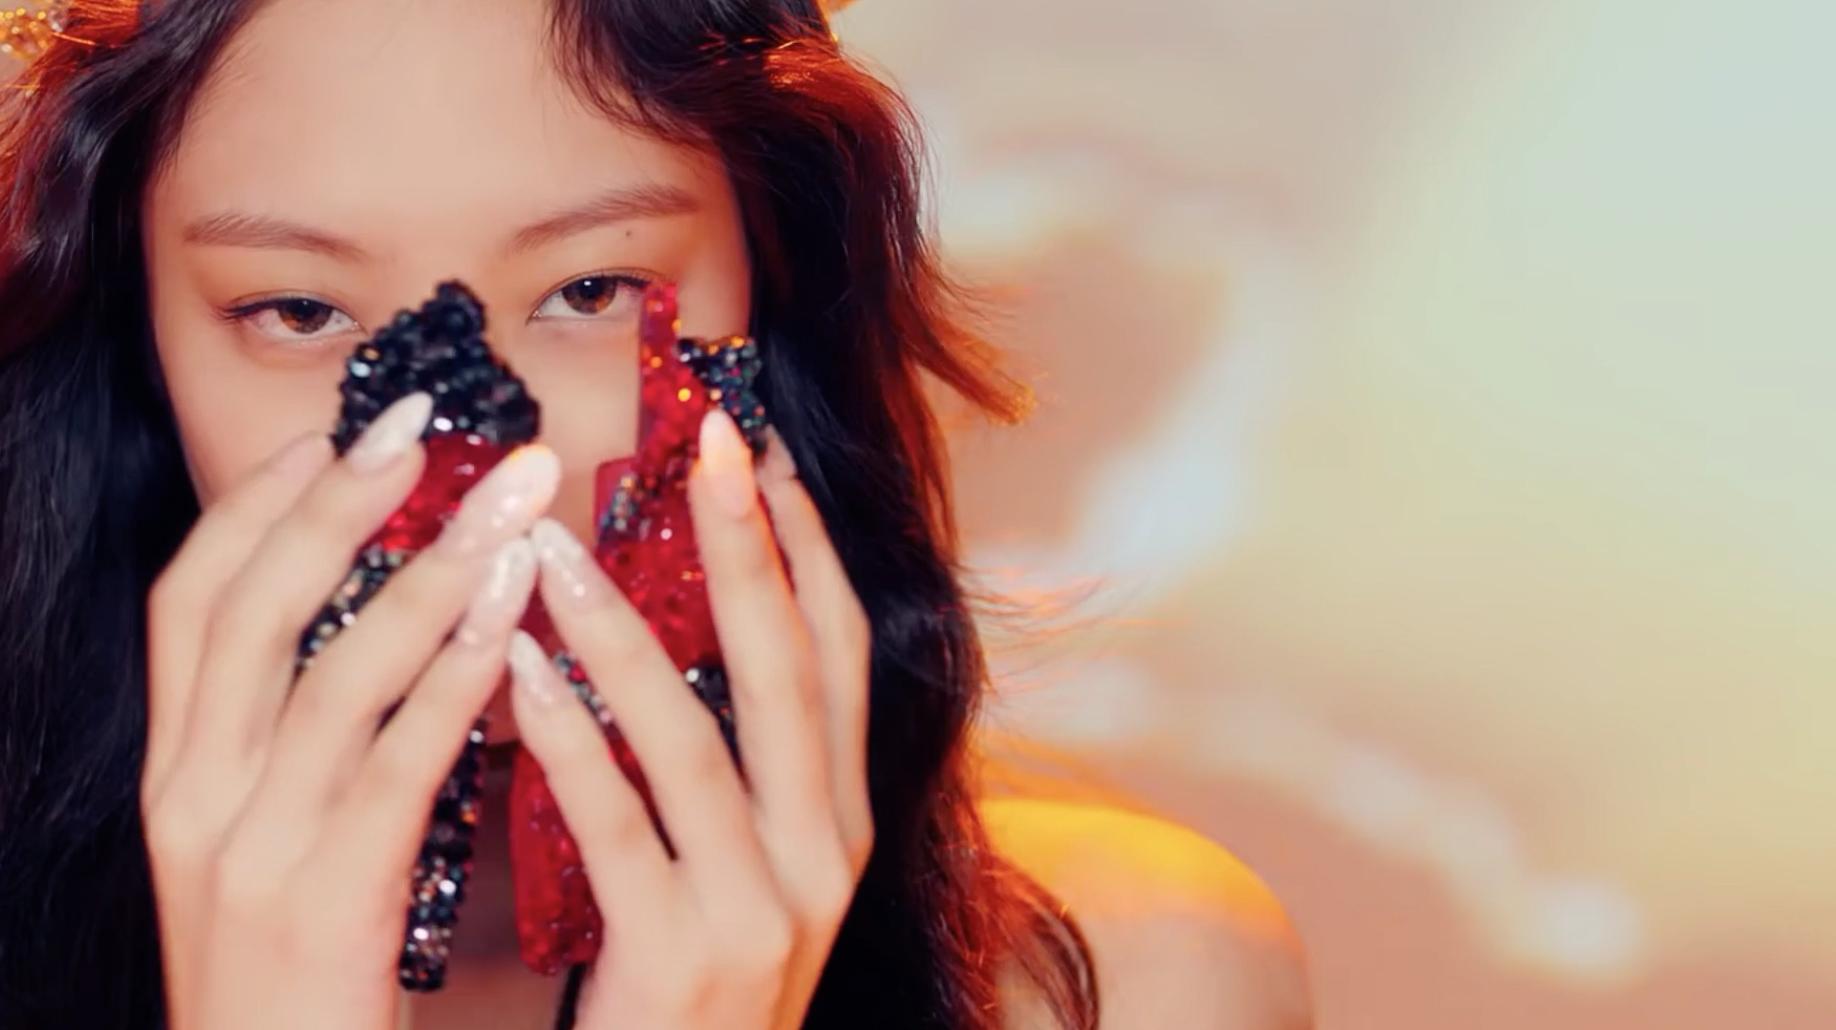 Jennie Kim Blackpink Best Compatible Ships Jennie Kim Blackpink Kpop Idol Kim